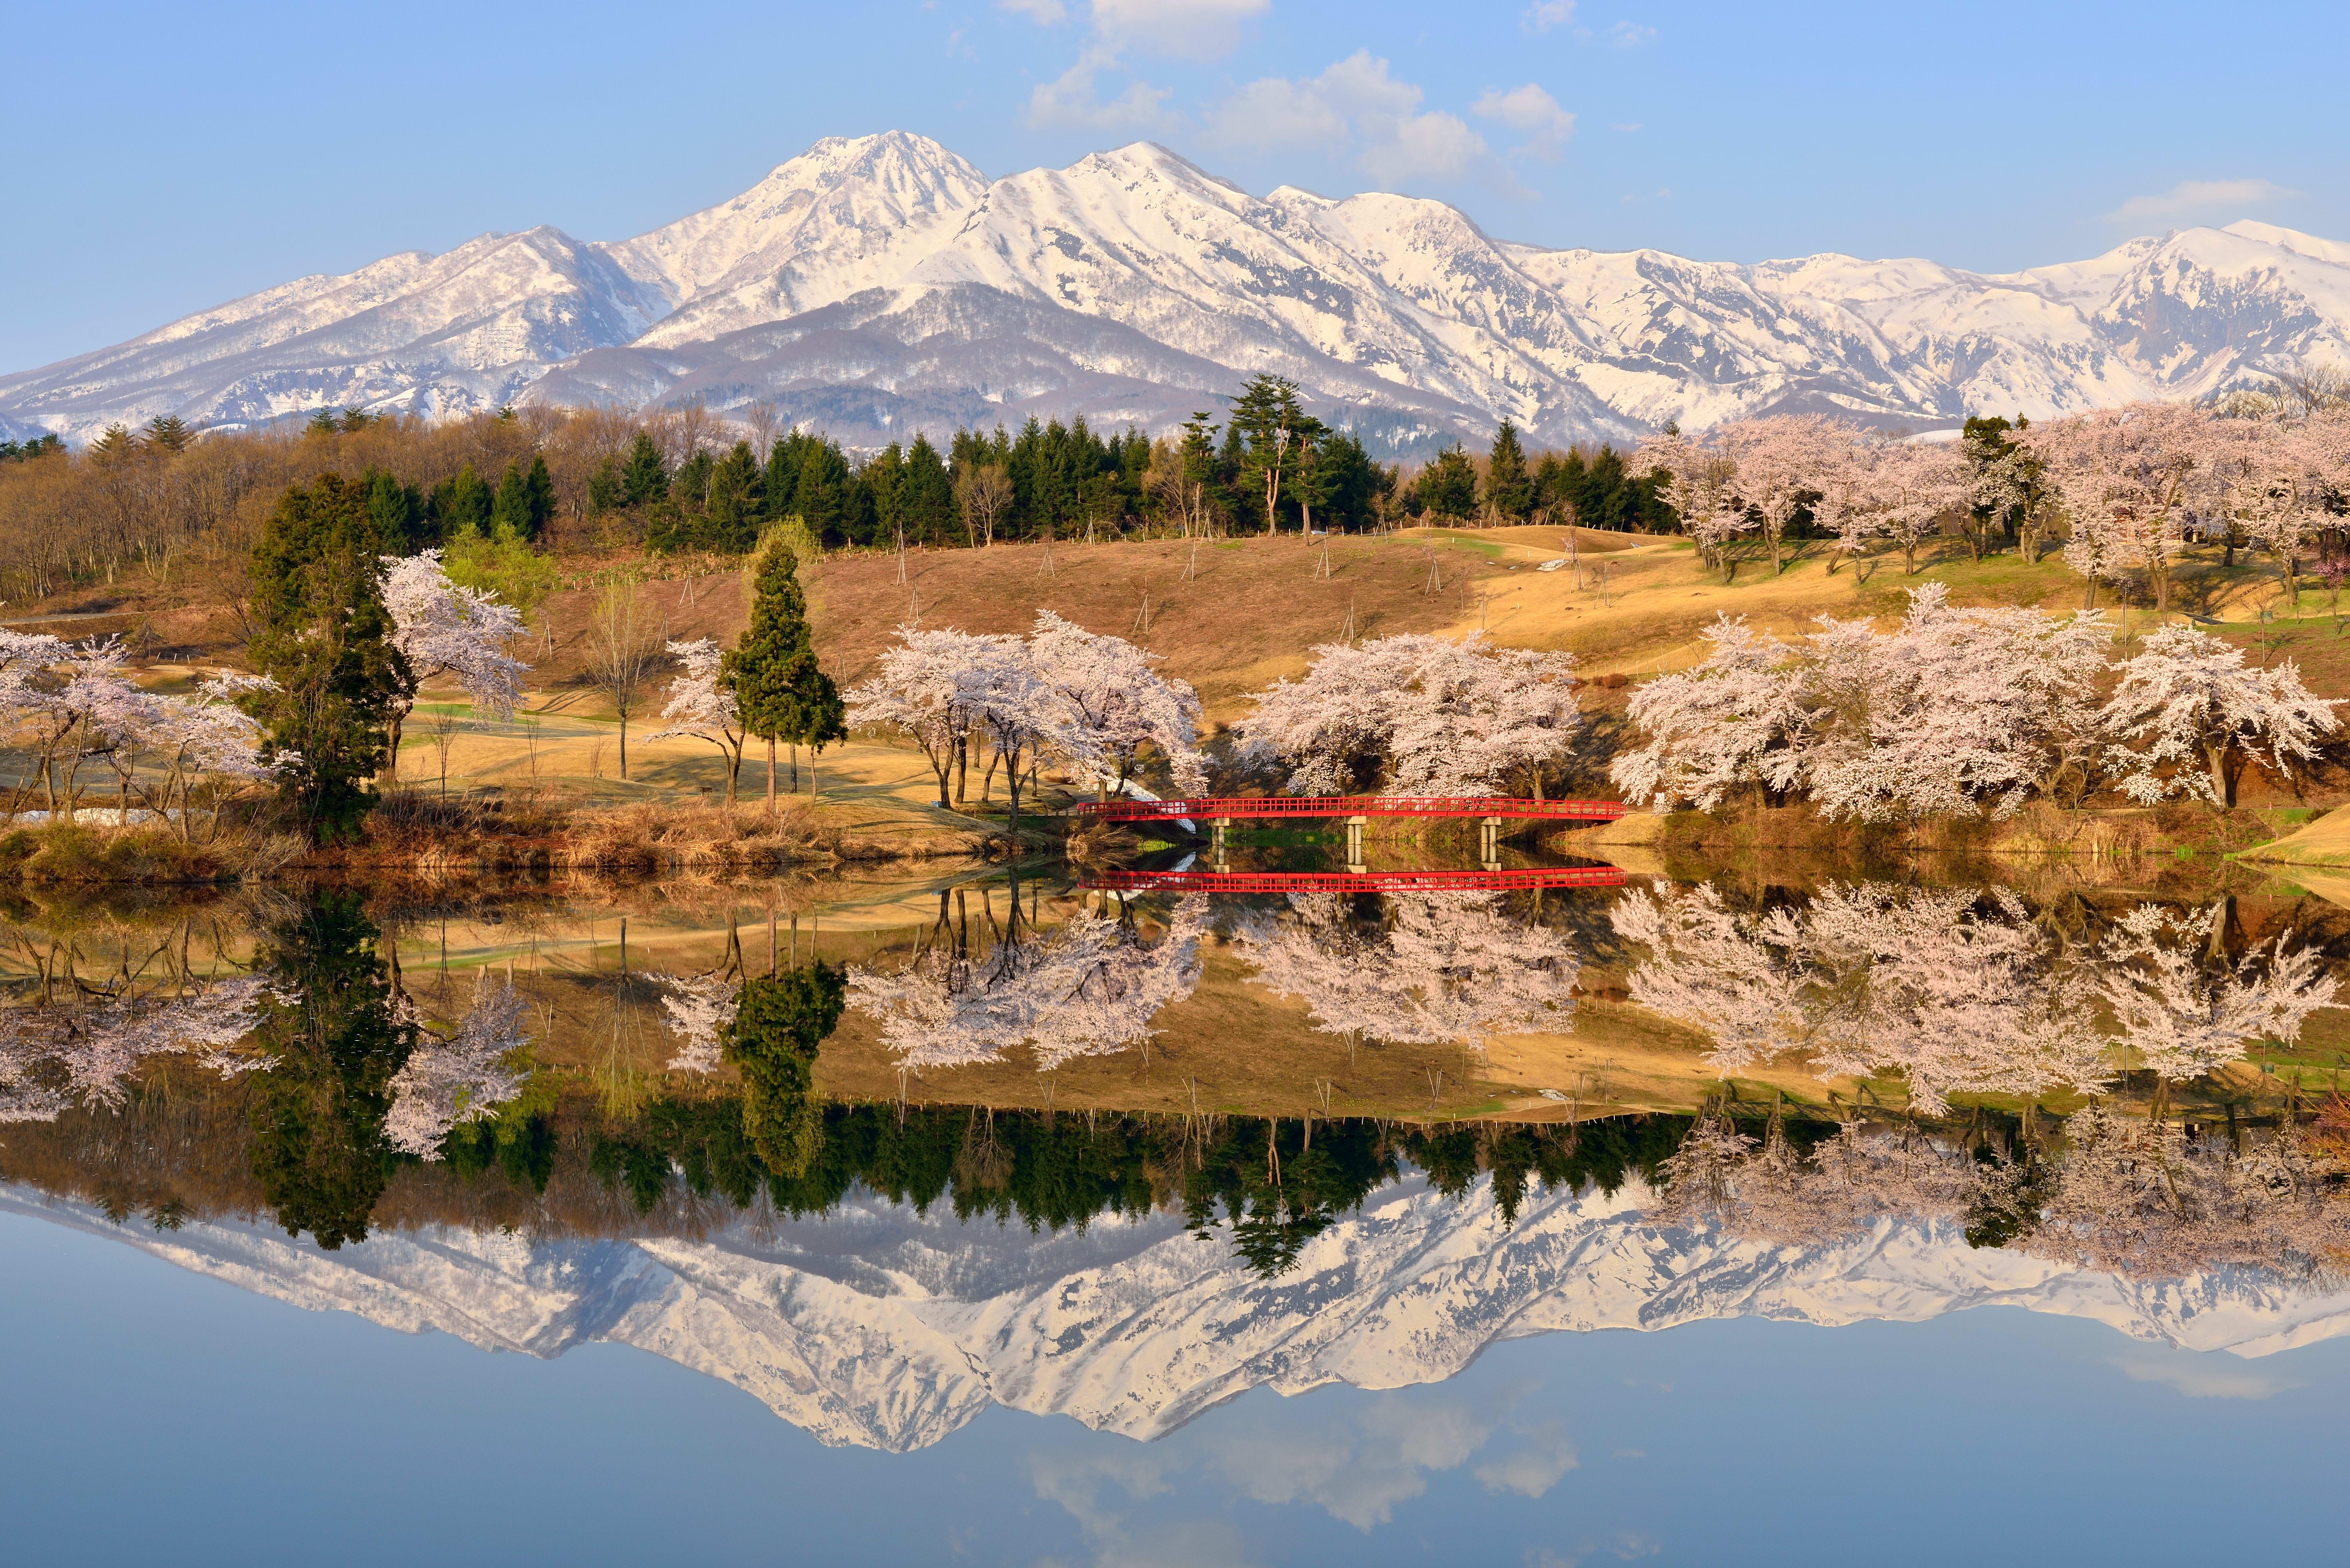 Lake Reisenji and Hokushin-Gogaku Drive